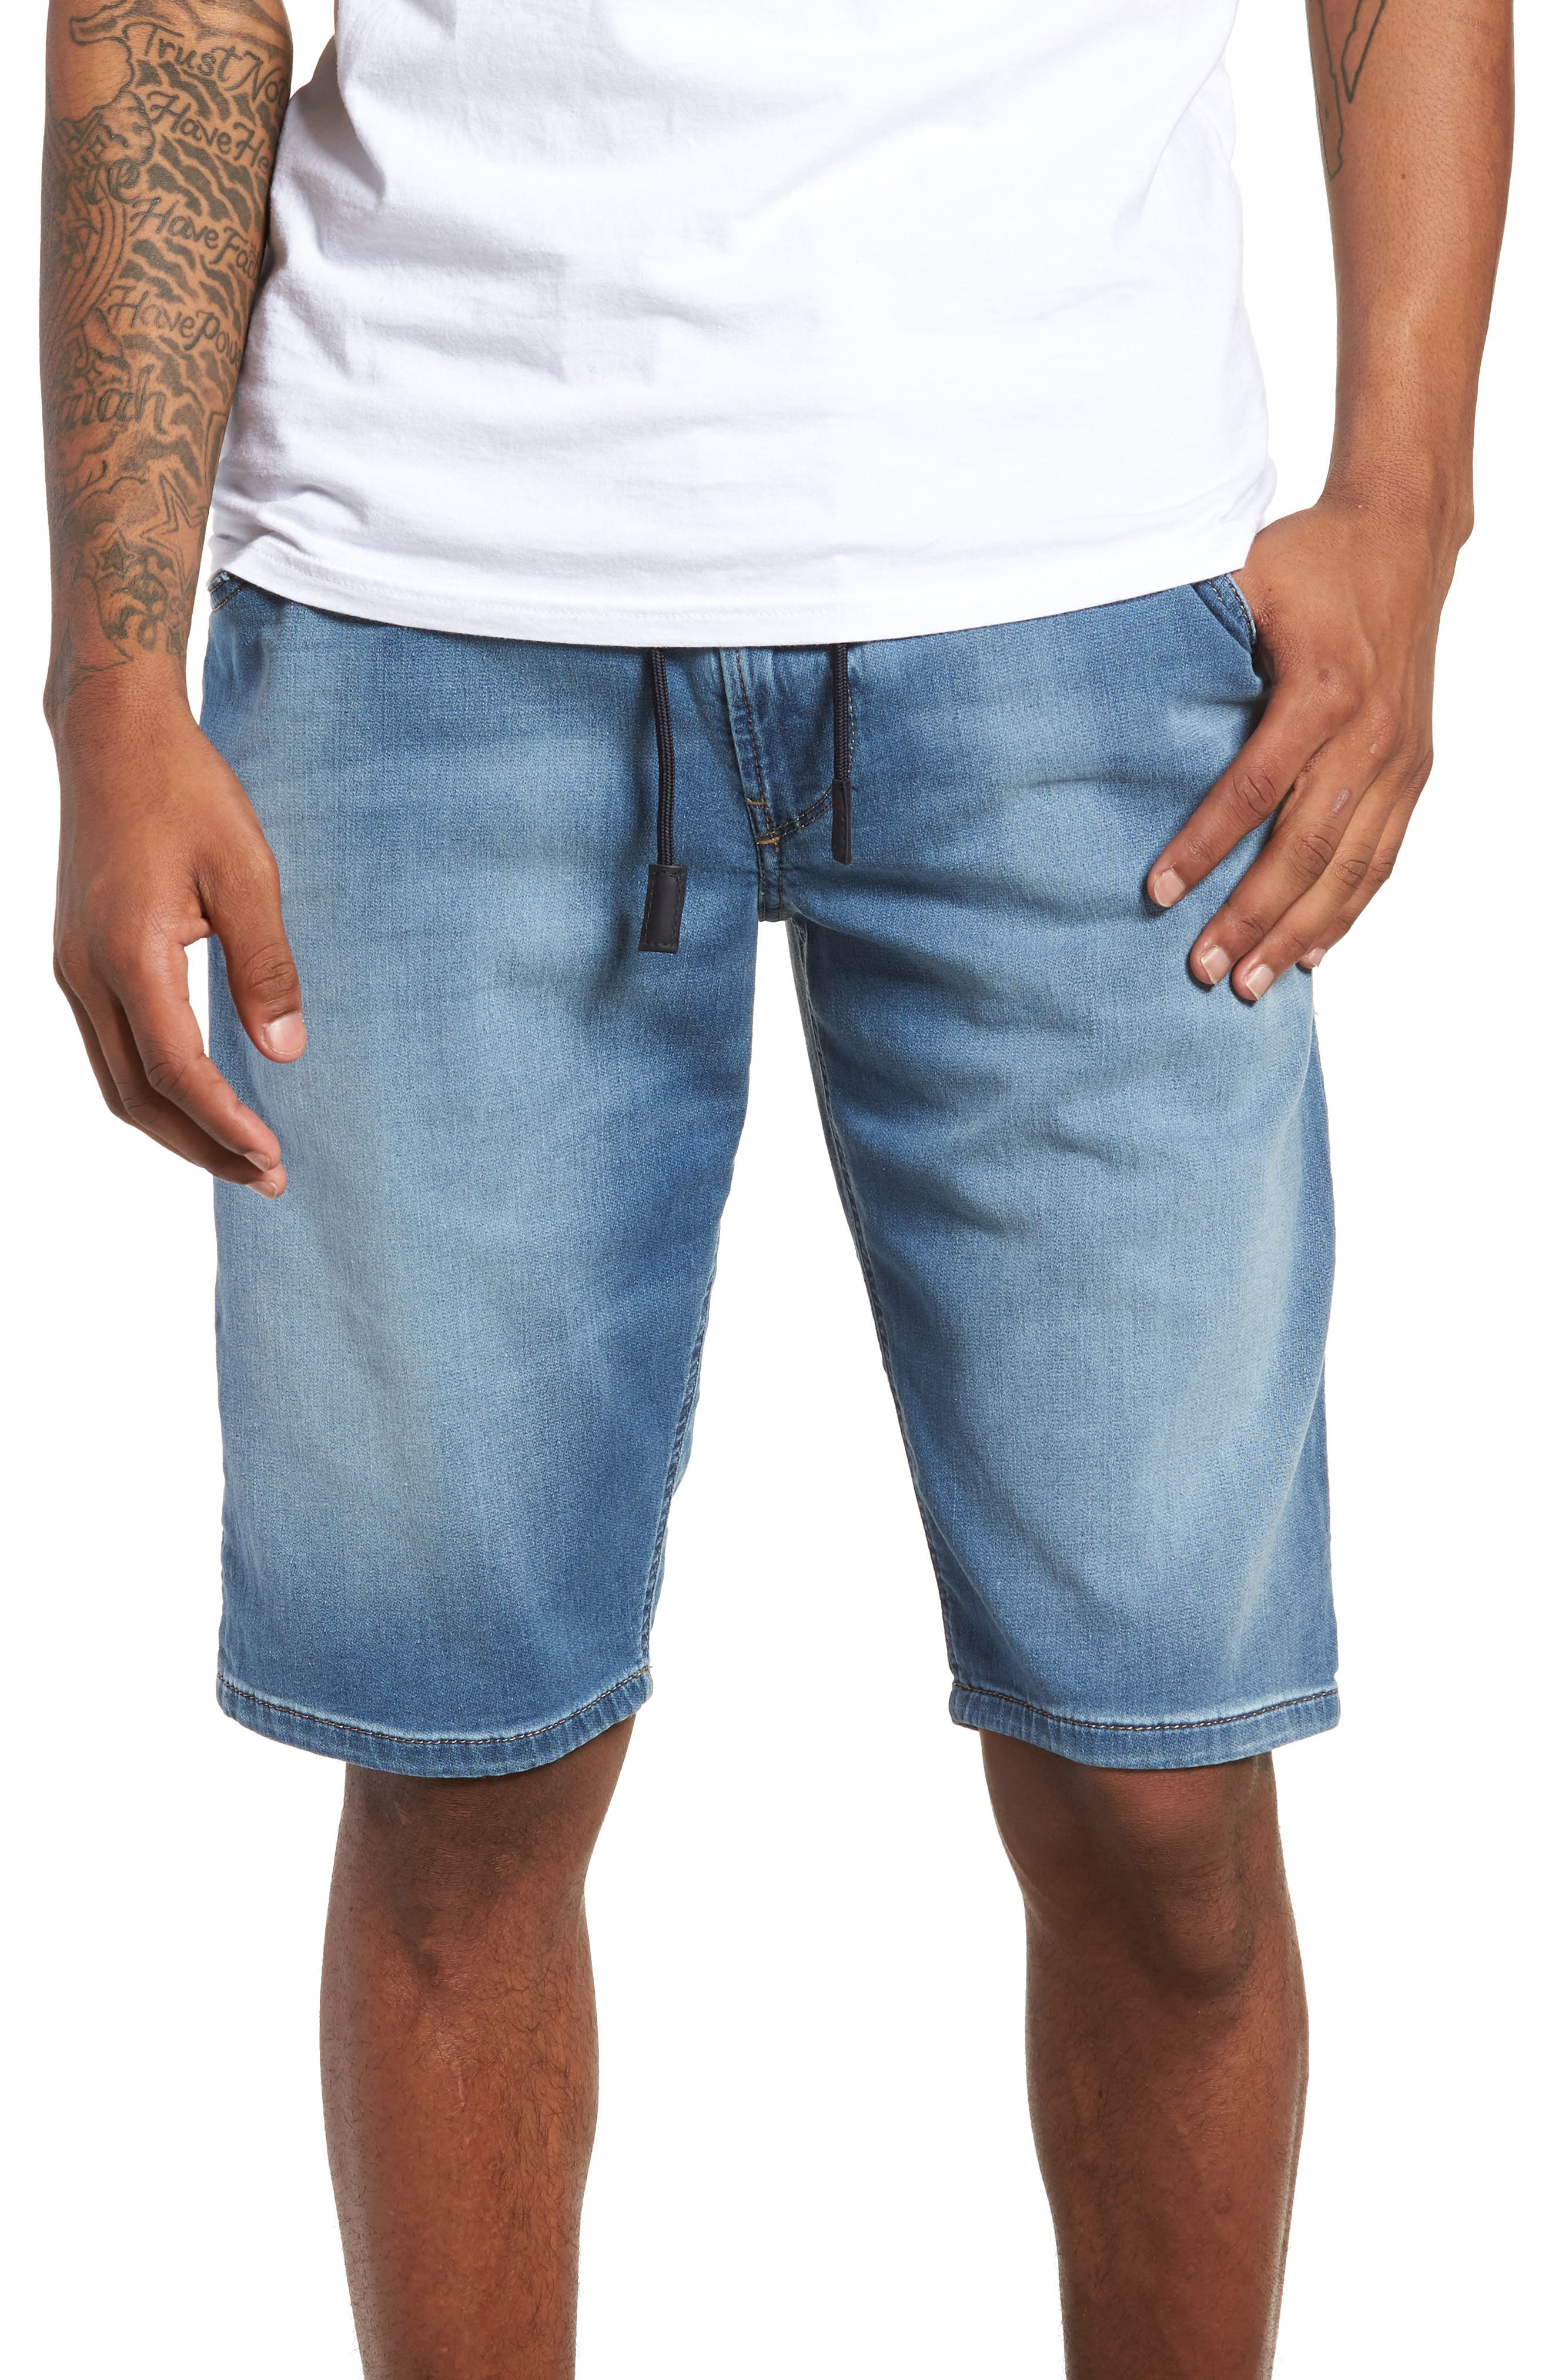 Krooshort Denim Shorts,                         Main,                         color, Denim